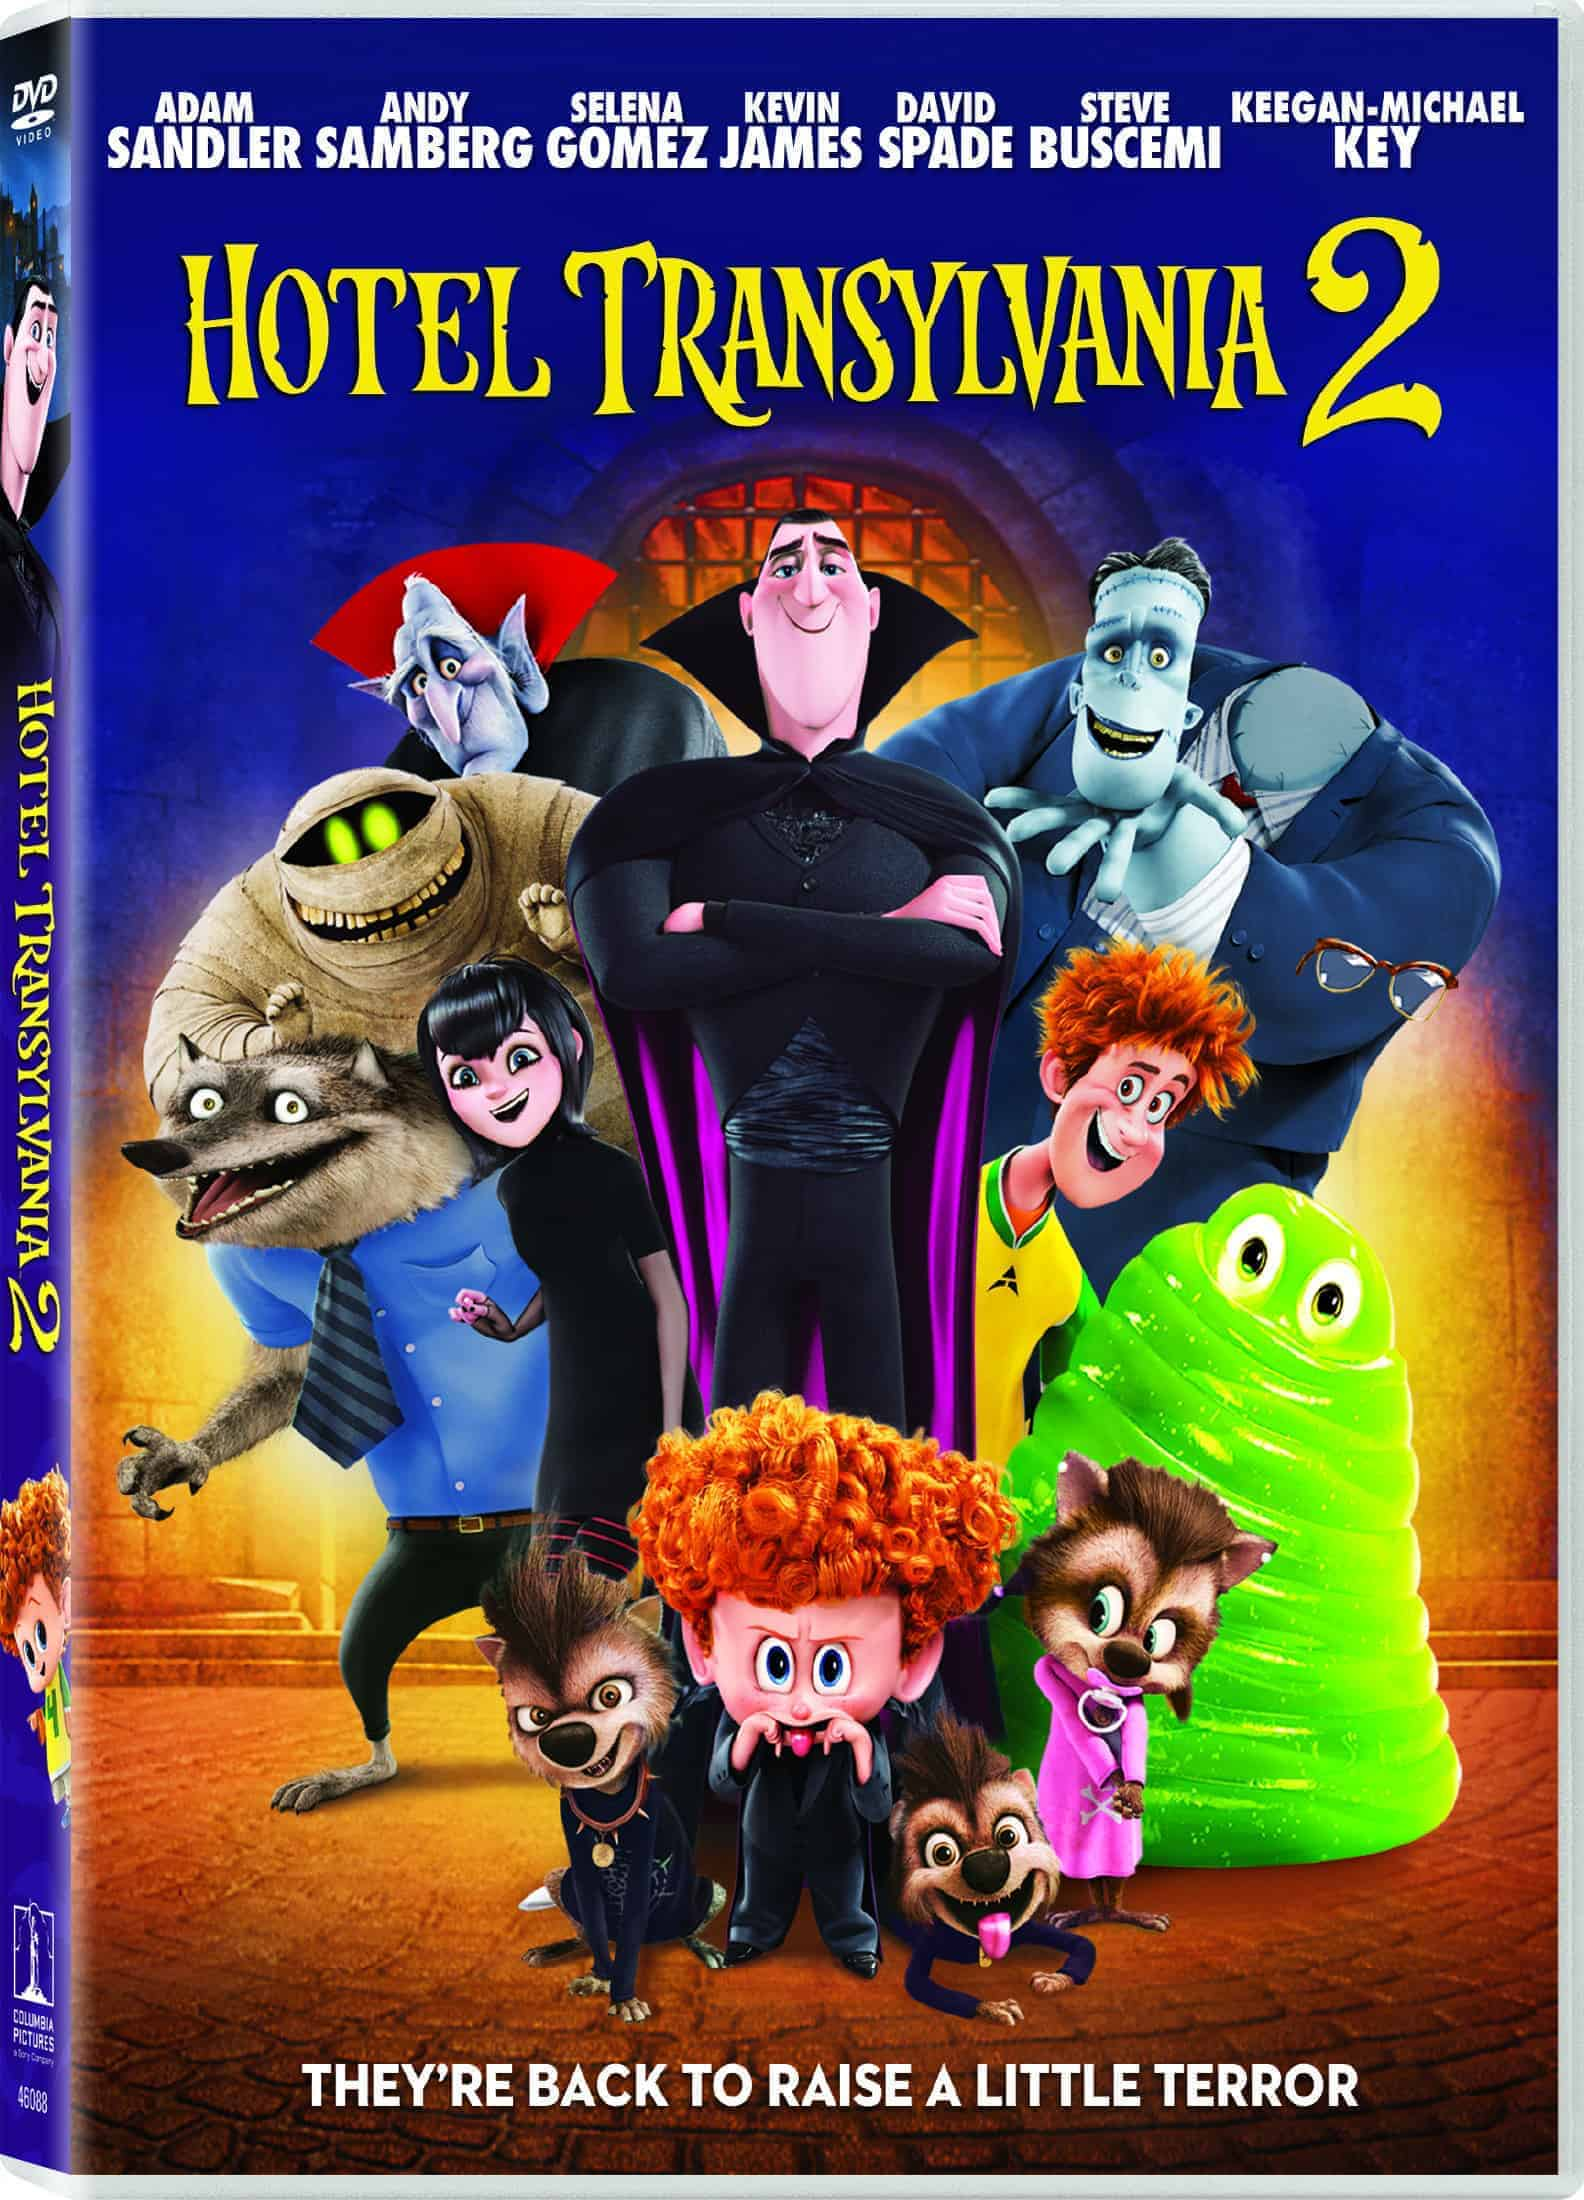 Win Hotel Transylvania & Hotel Transylvania 2 On DVD